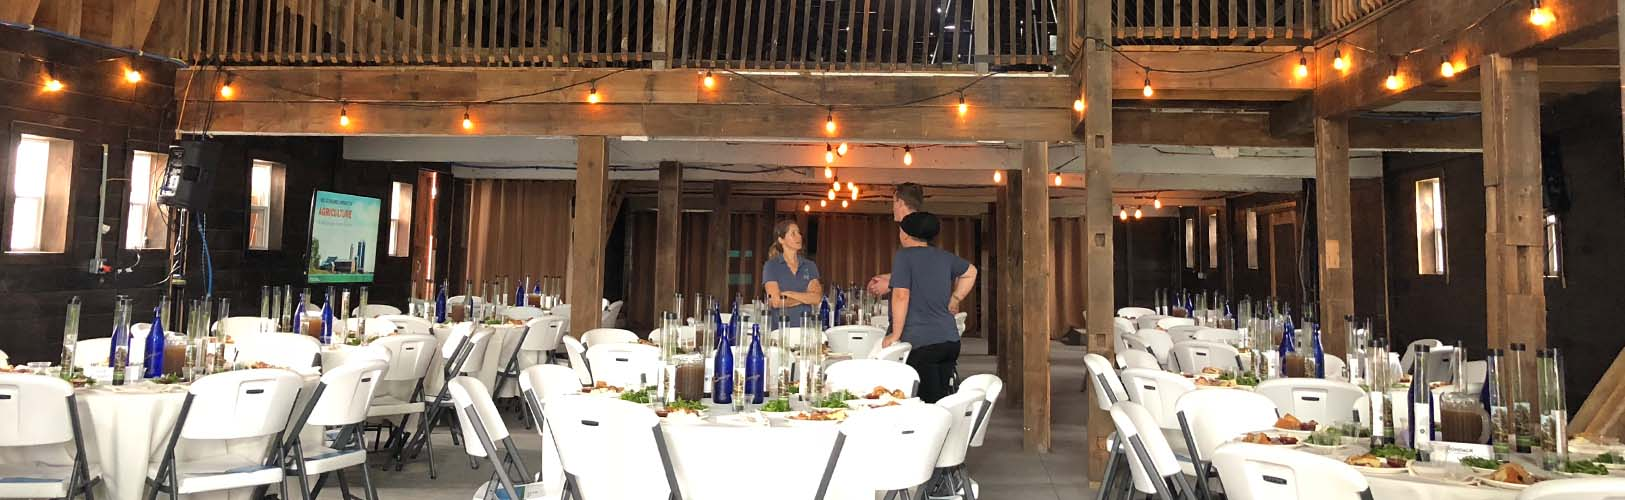 Inside the wedding barn